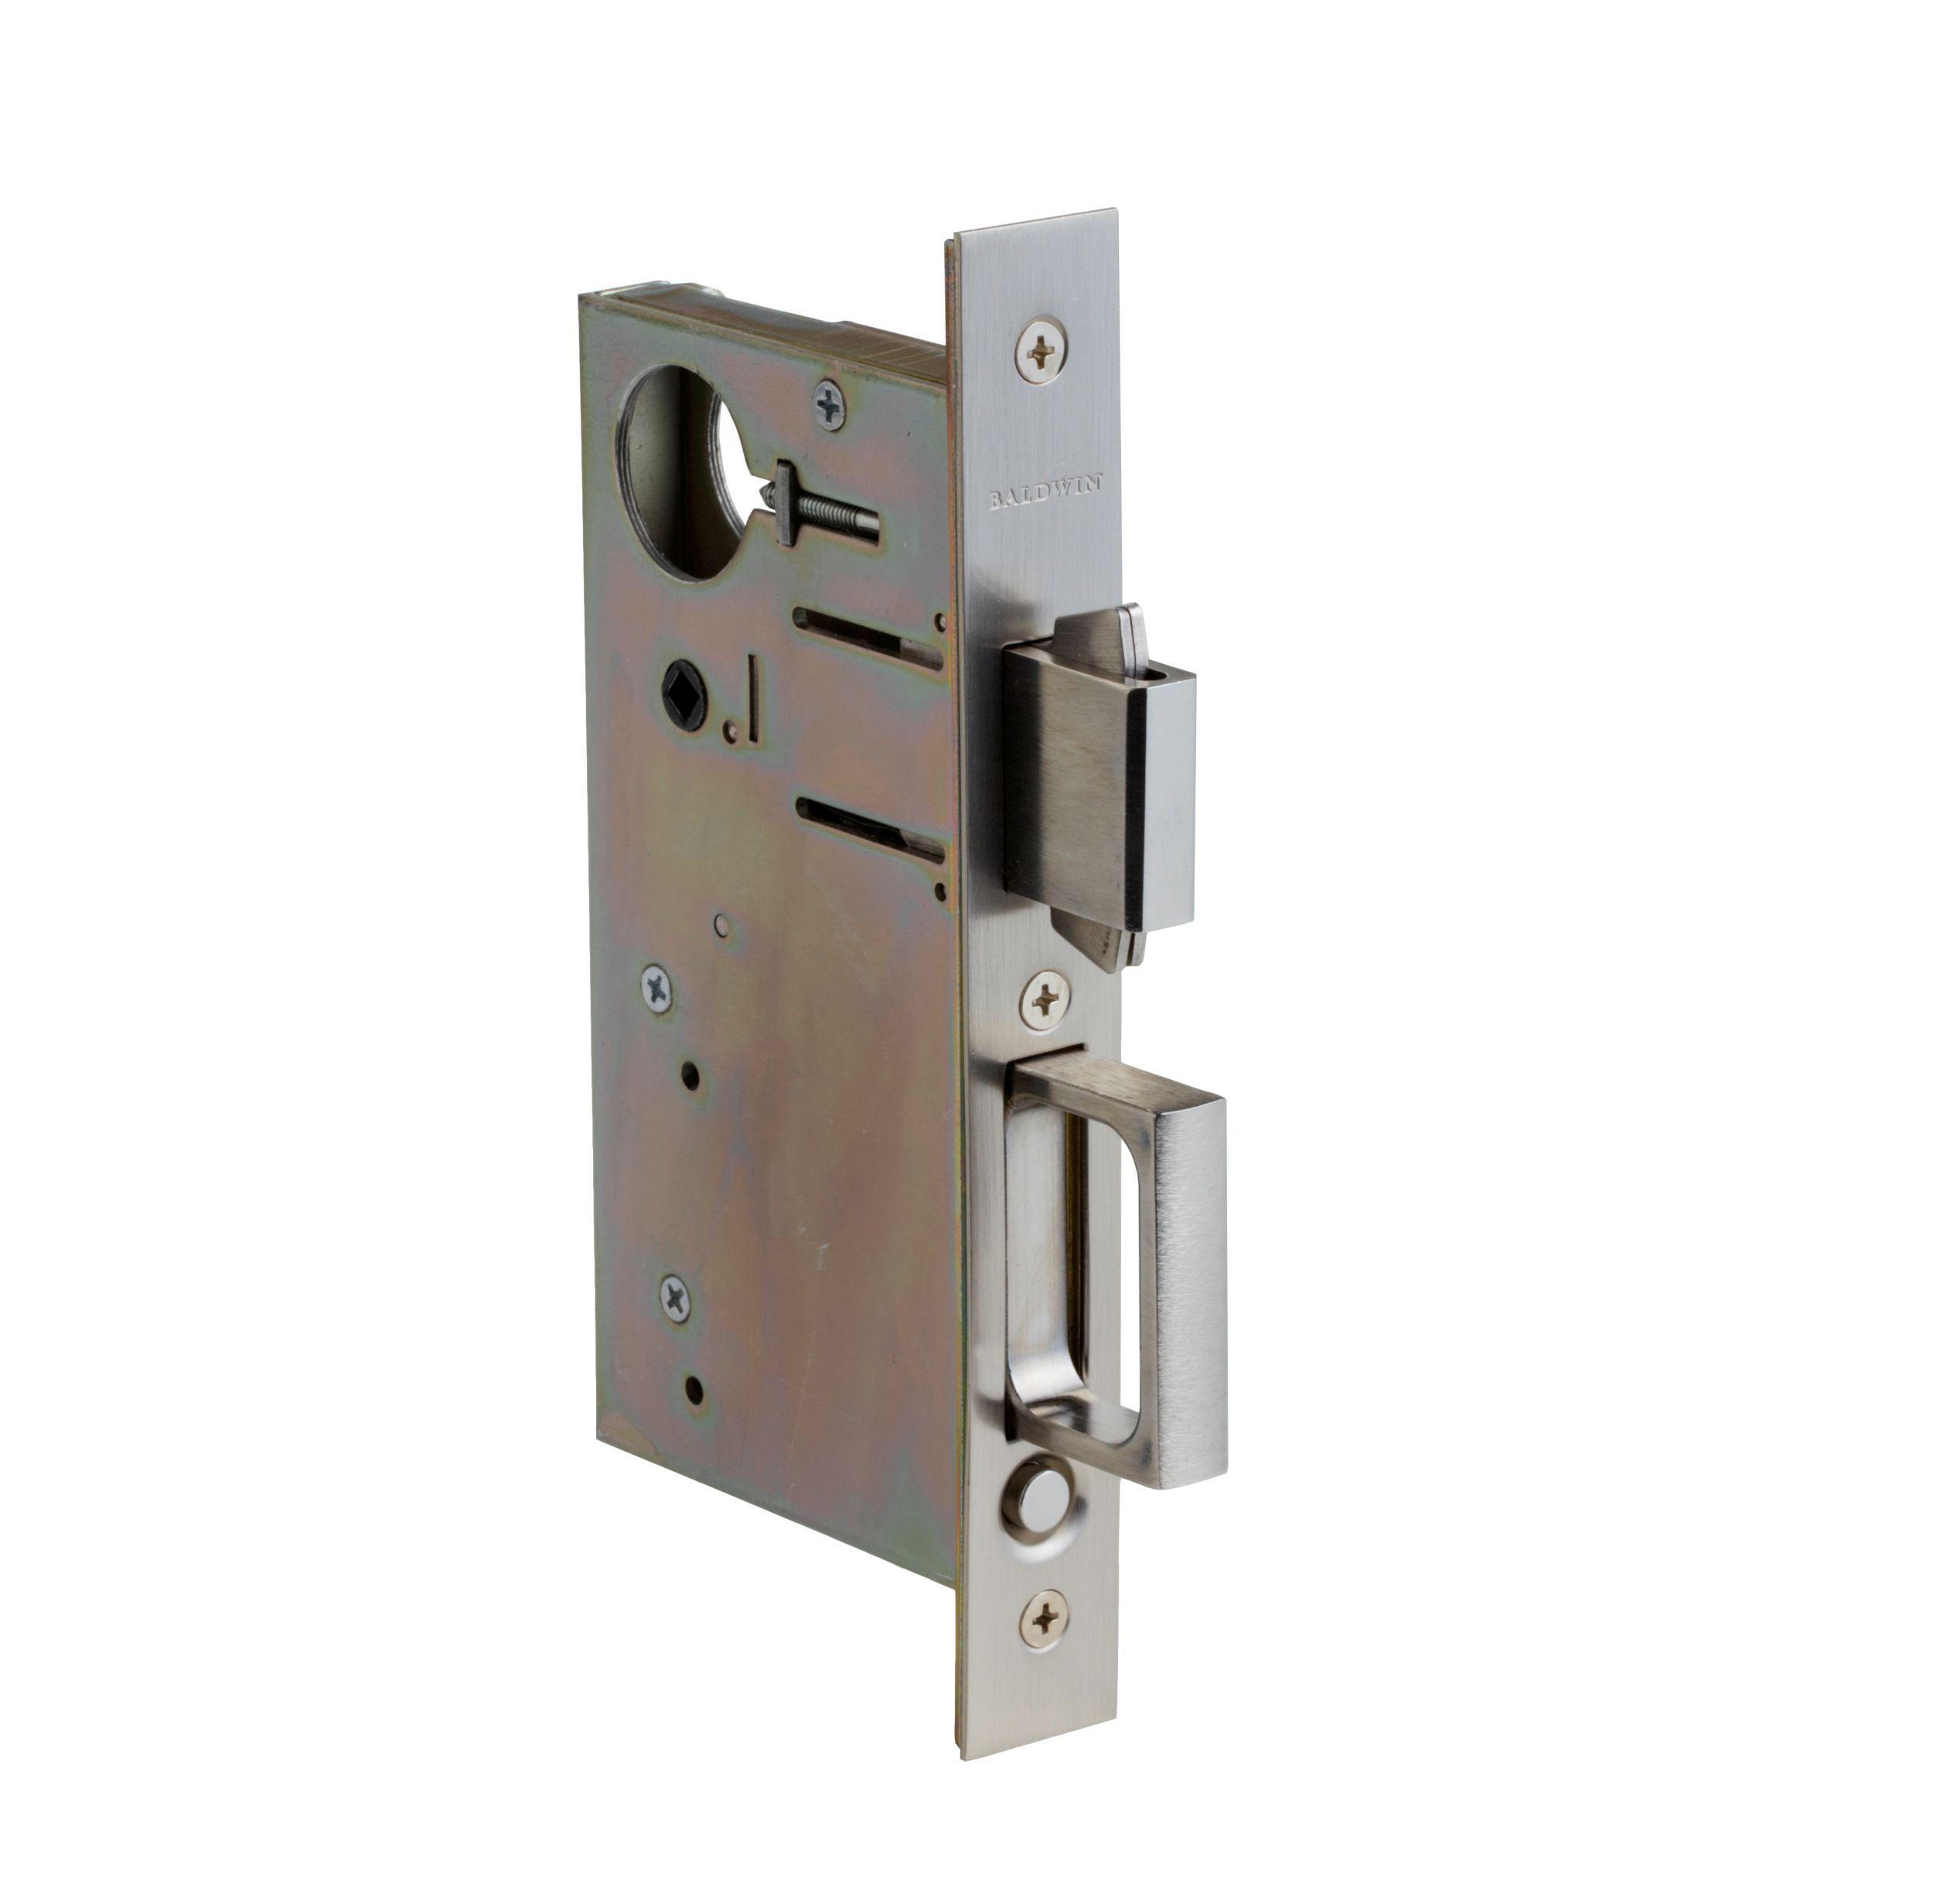 Sliding Door Pull Hardware: 8632 Pocket Door Lock With Pull (8632.150